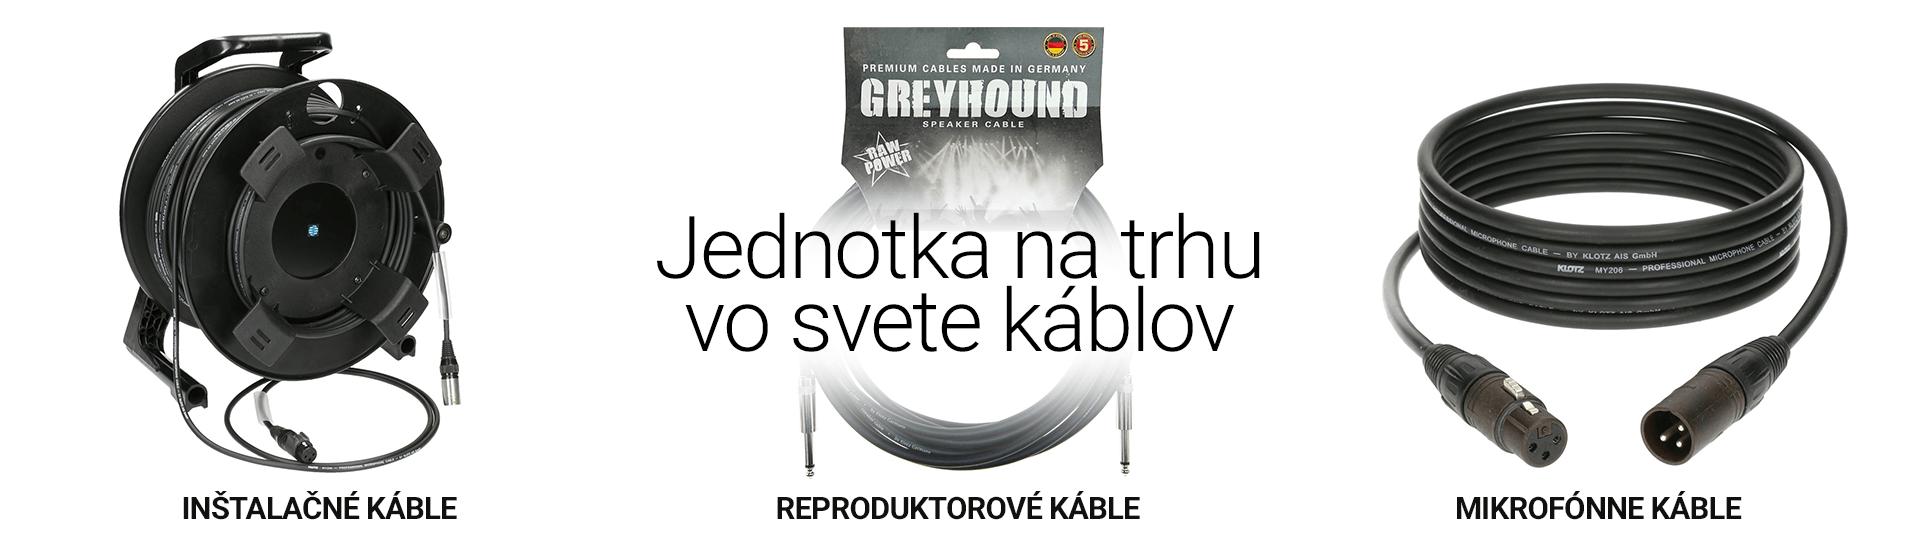 Klozt_SK